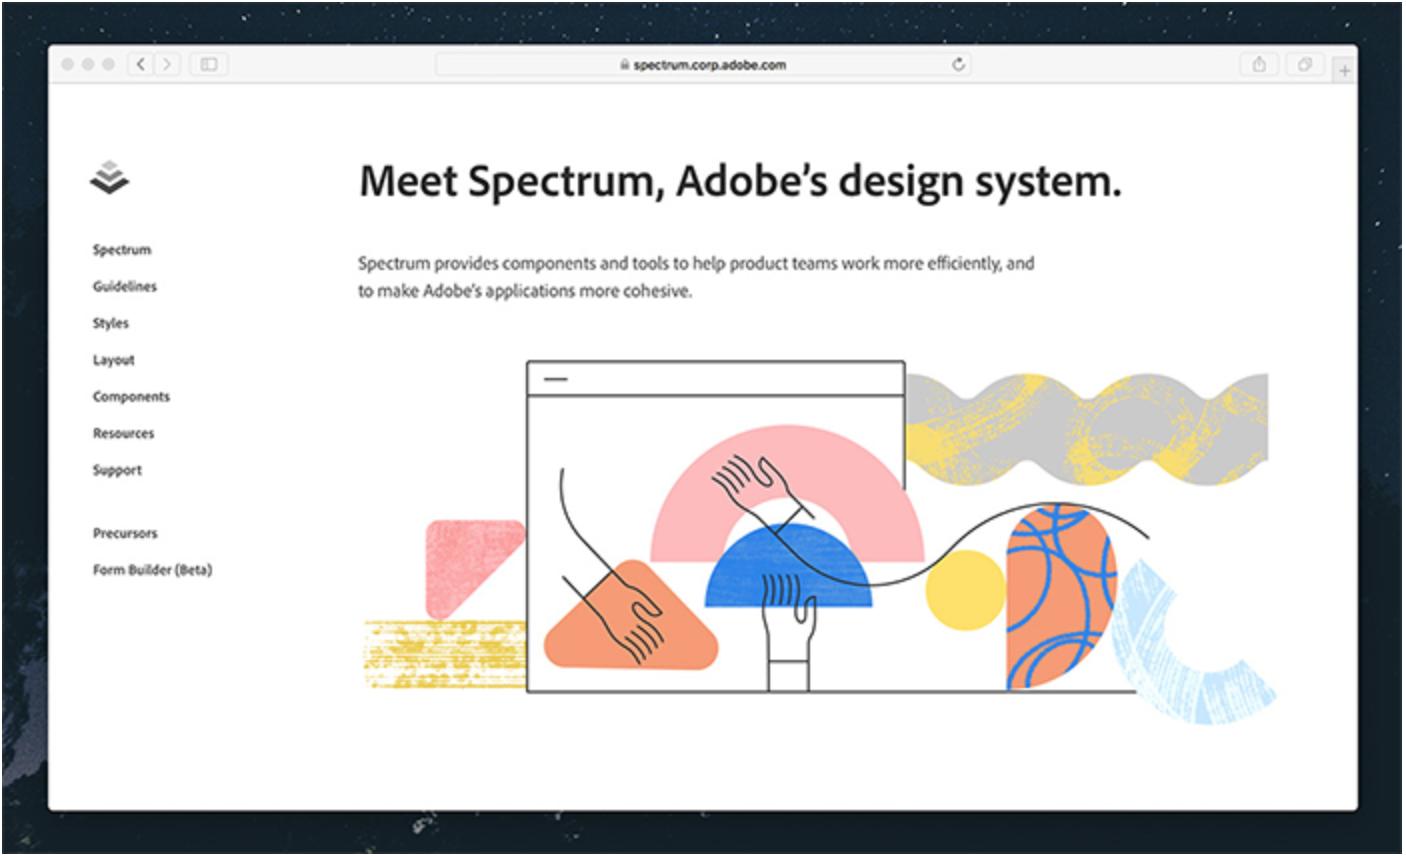 Screenshot of the Adobe Spectrum Design System online resource hub.